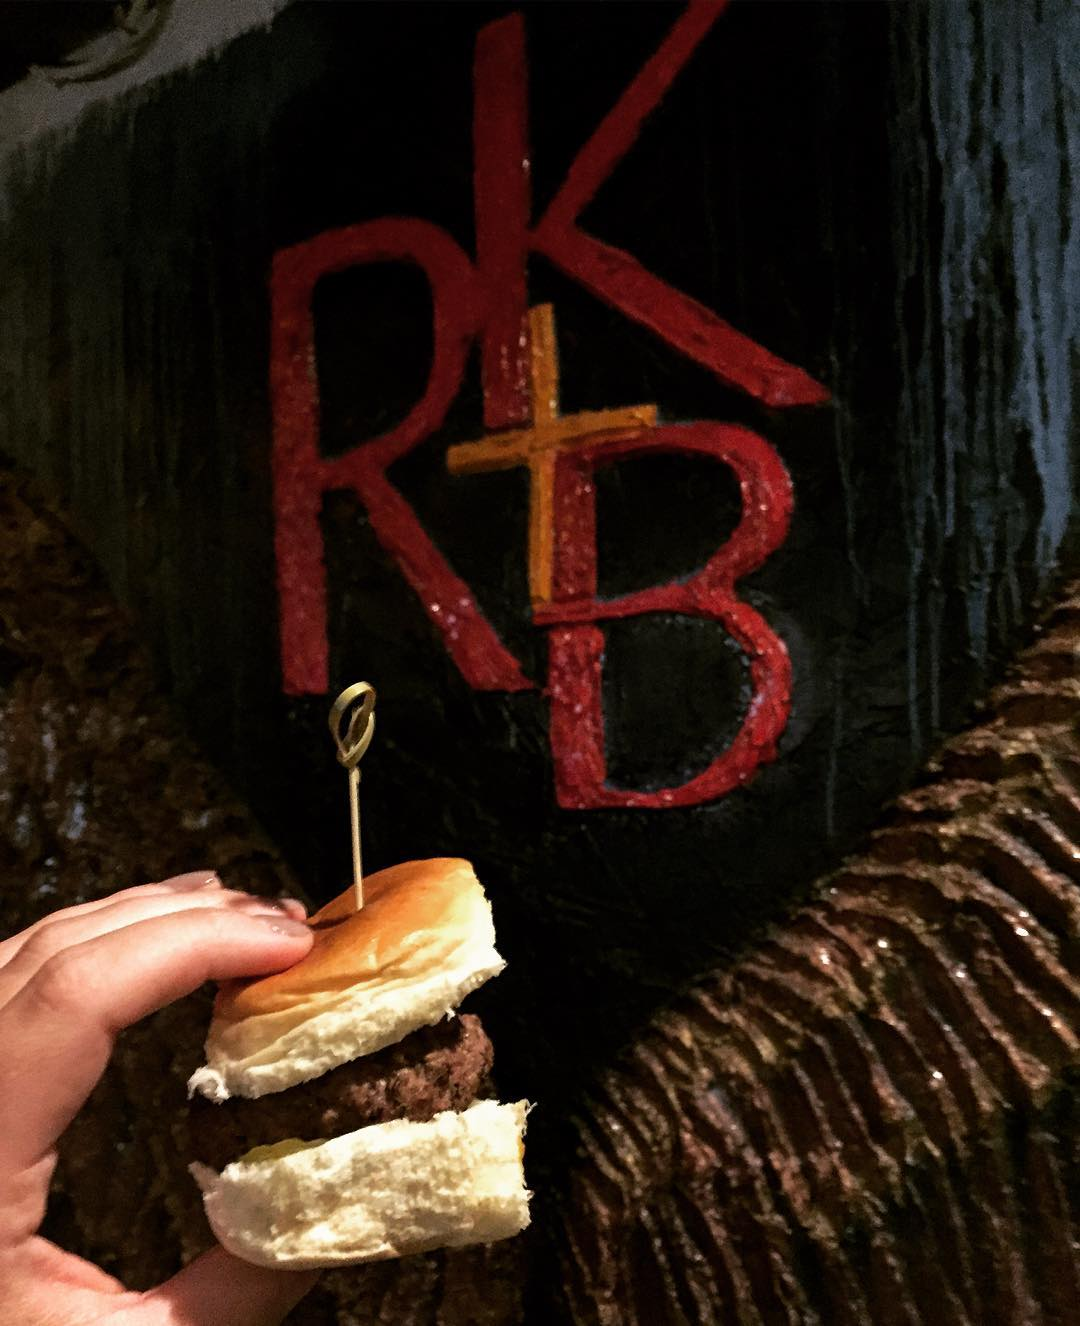 revelry kitchen bar visual menureviews by food bloggersinstagrammers - Revelry Kitchen